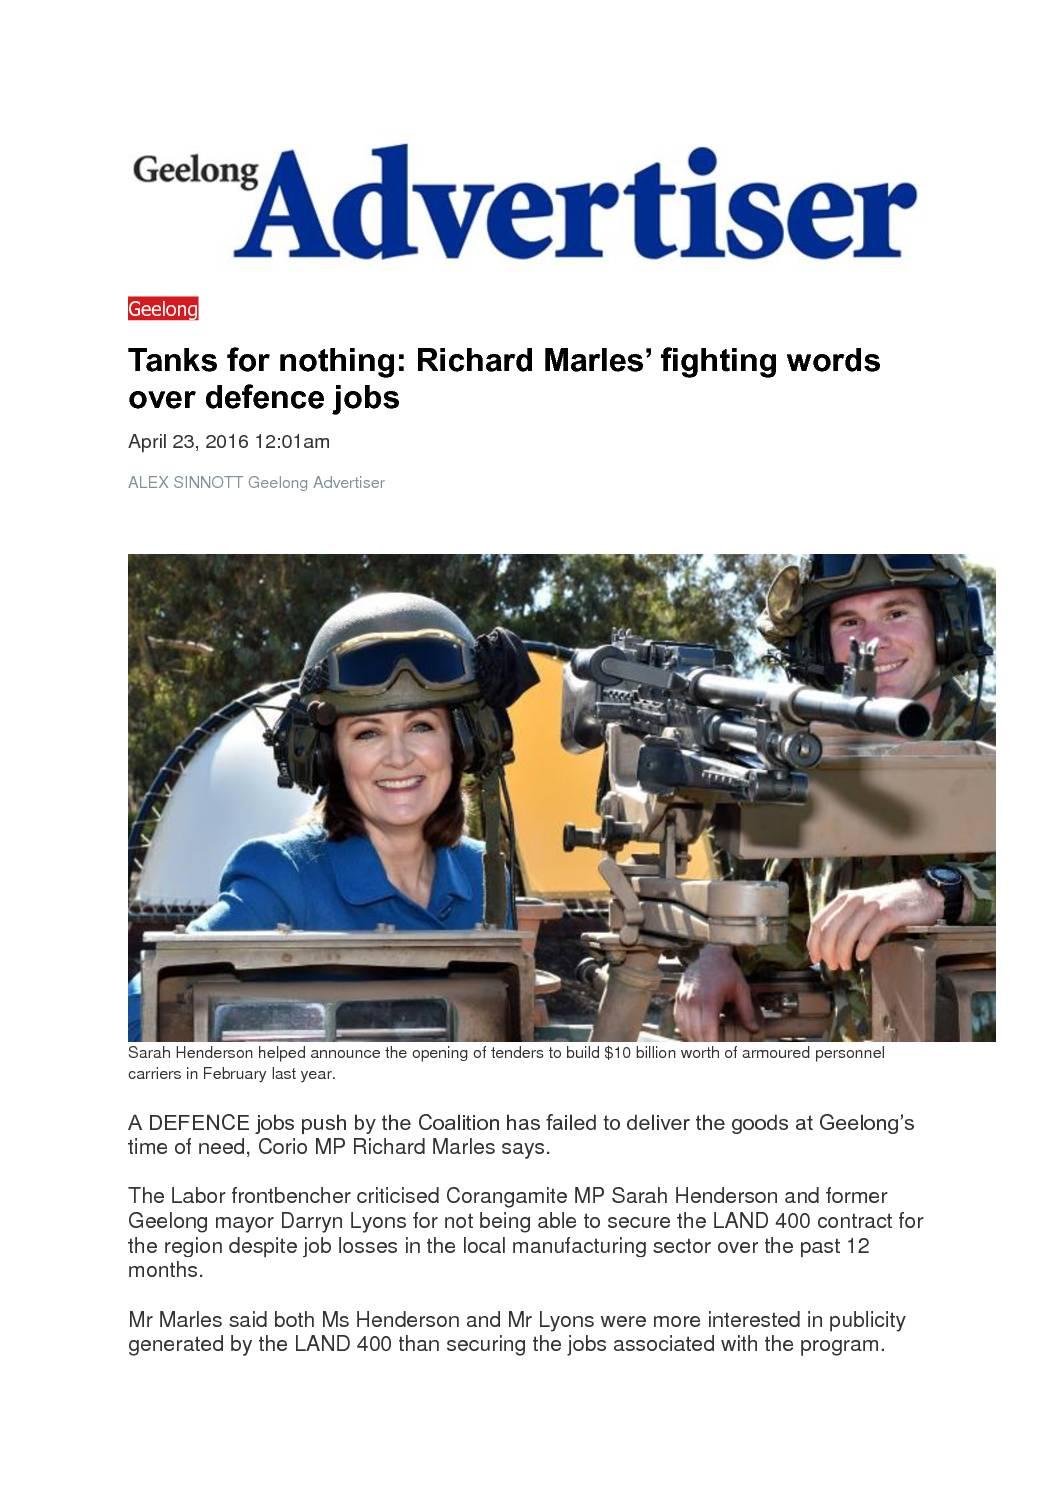 16.04.23 Land 400 Geelong Advertiser